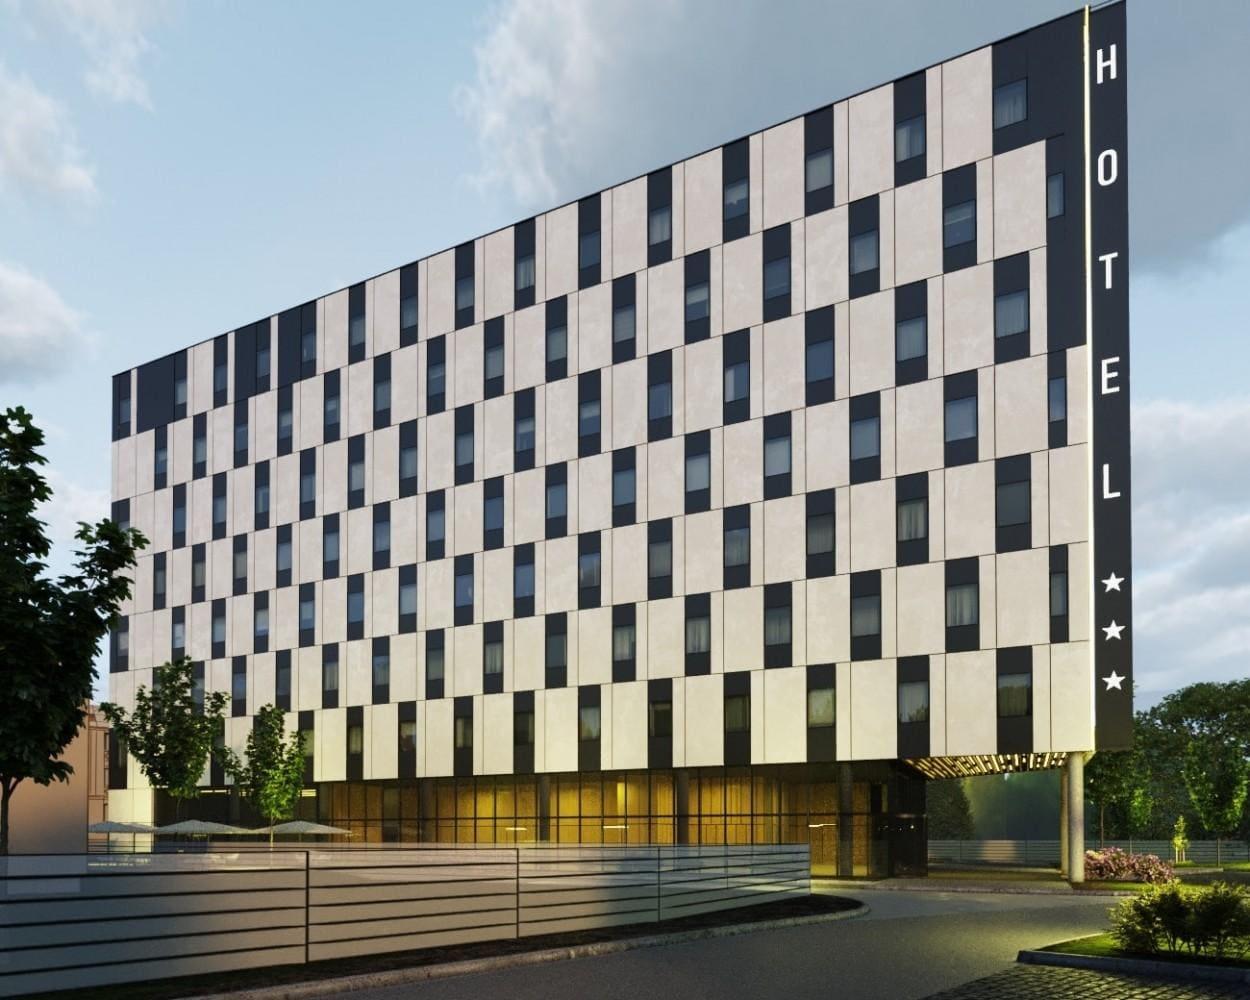 HOTEL ul Gliwicka Katowice 2